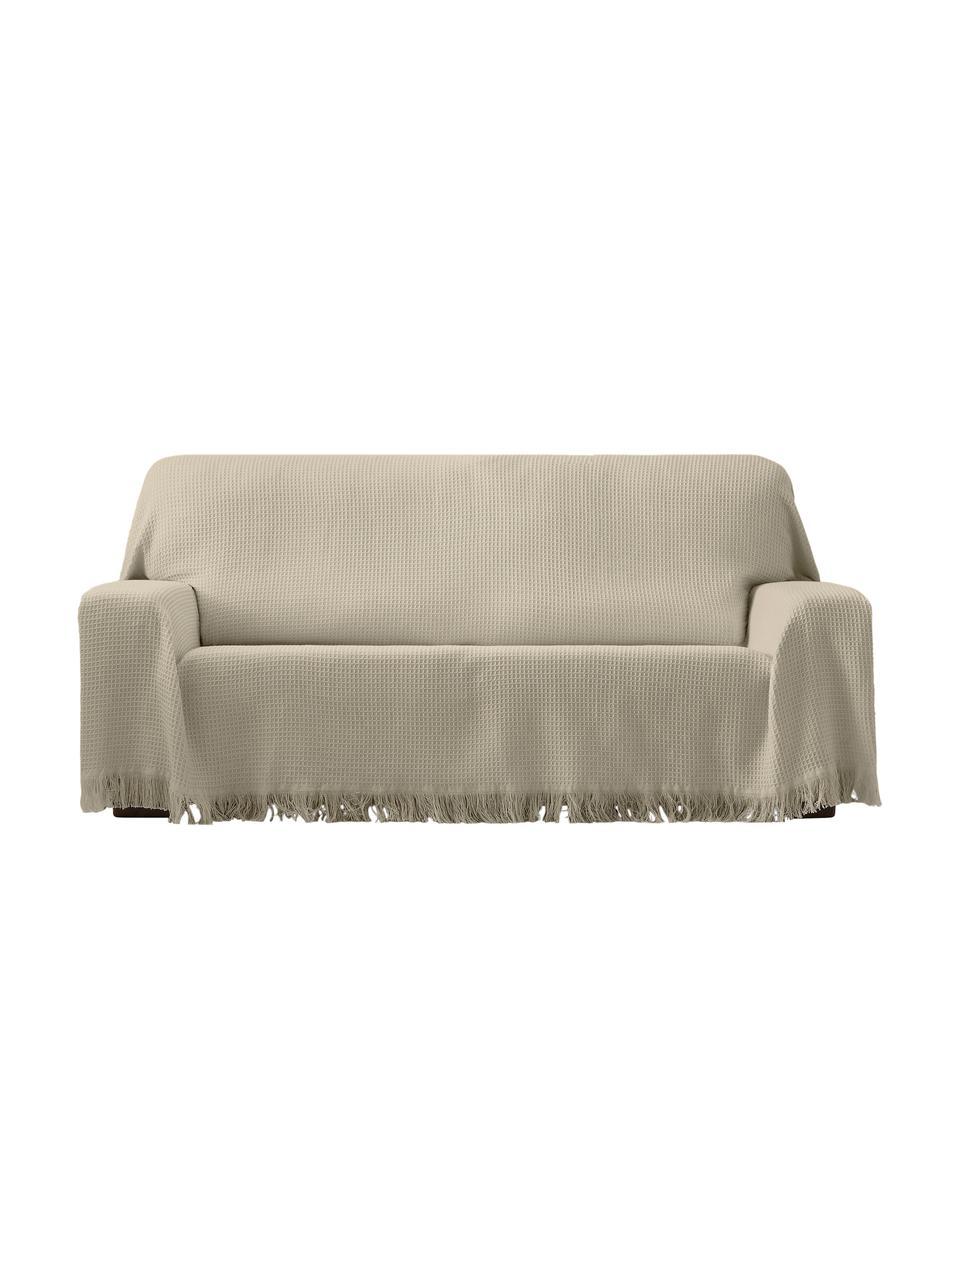 Funda sofá multifuncional Amazonas, 80%algodón, 20%otras fibras, Gris verdoso, An 230 x L 260 cm